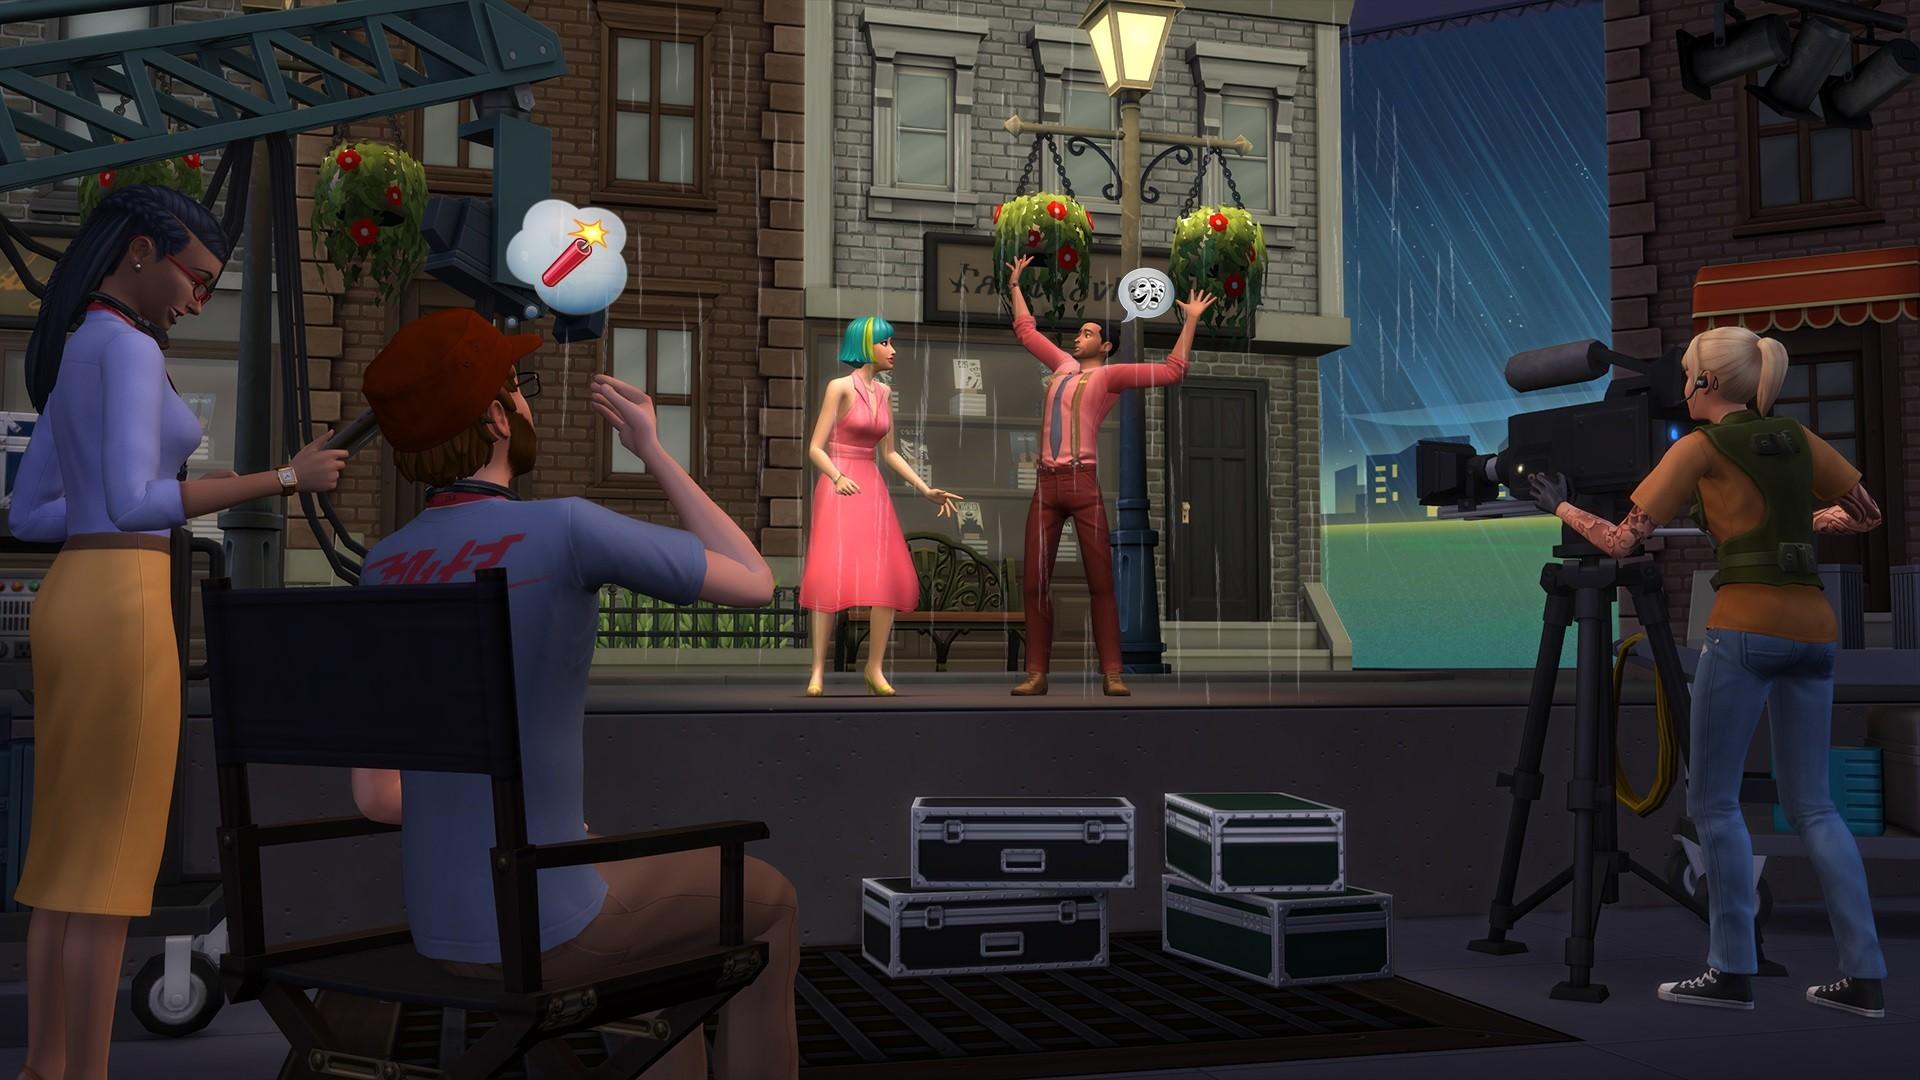 Sims ger dig nytt liv